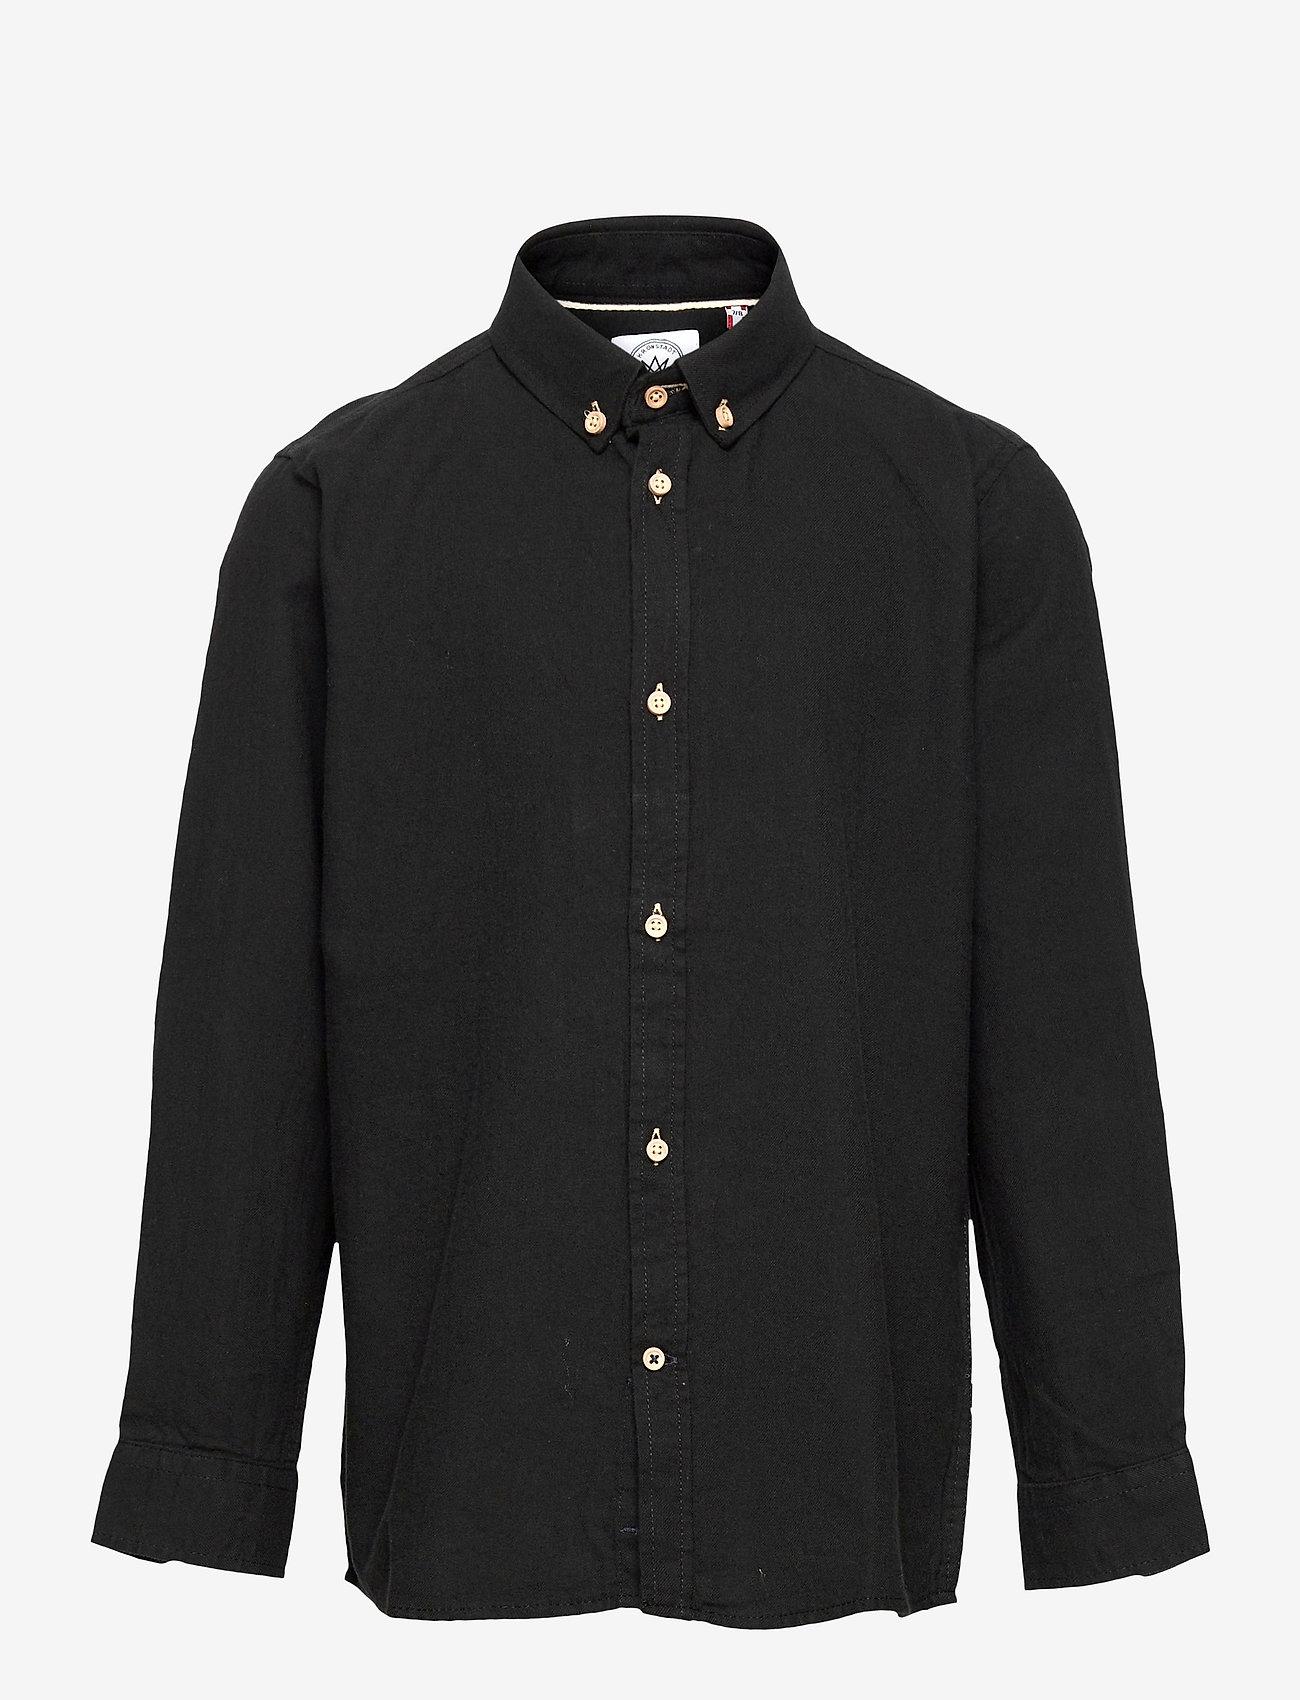 Kronstadt - Johan Diego - shirts - black - 0